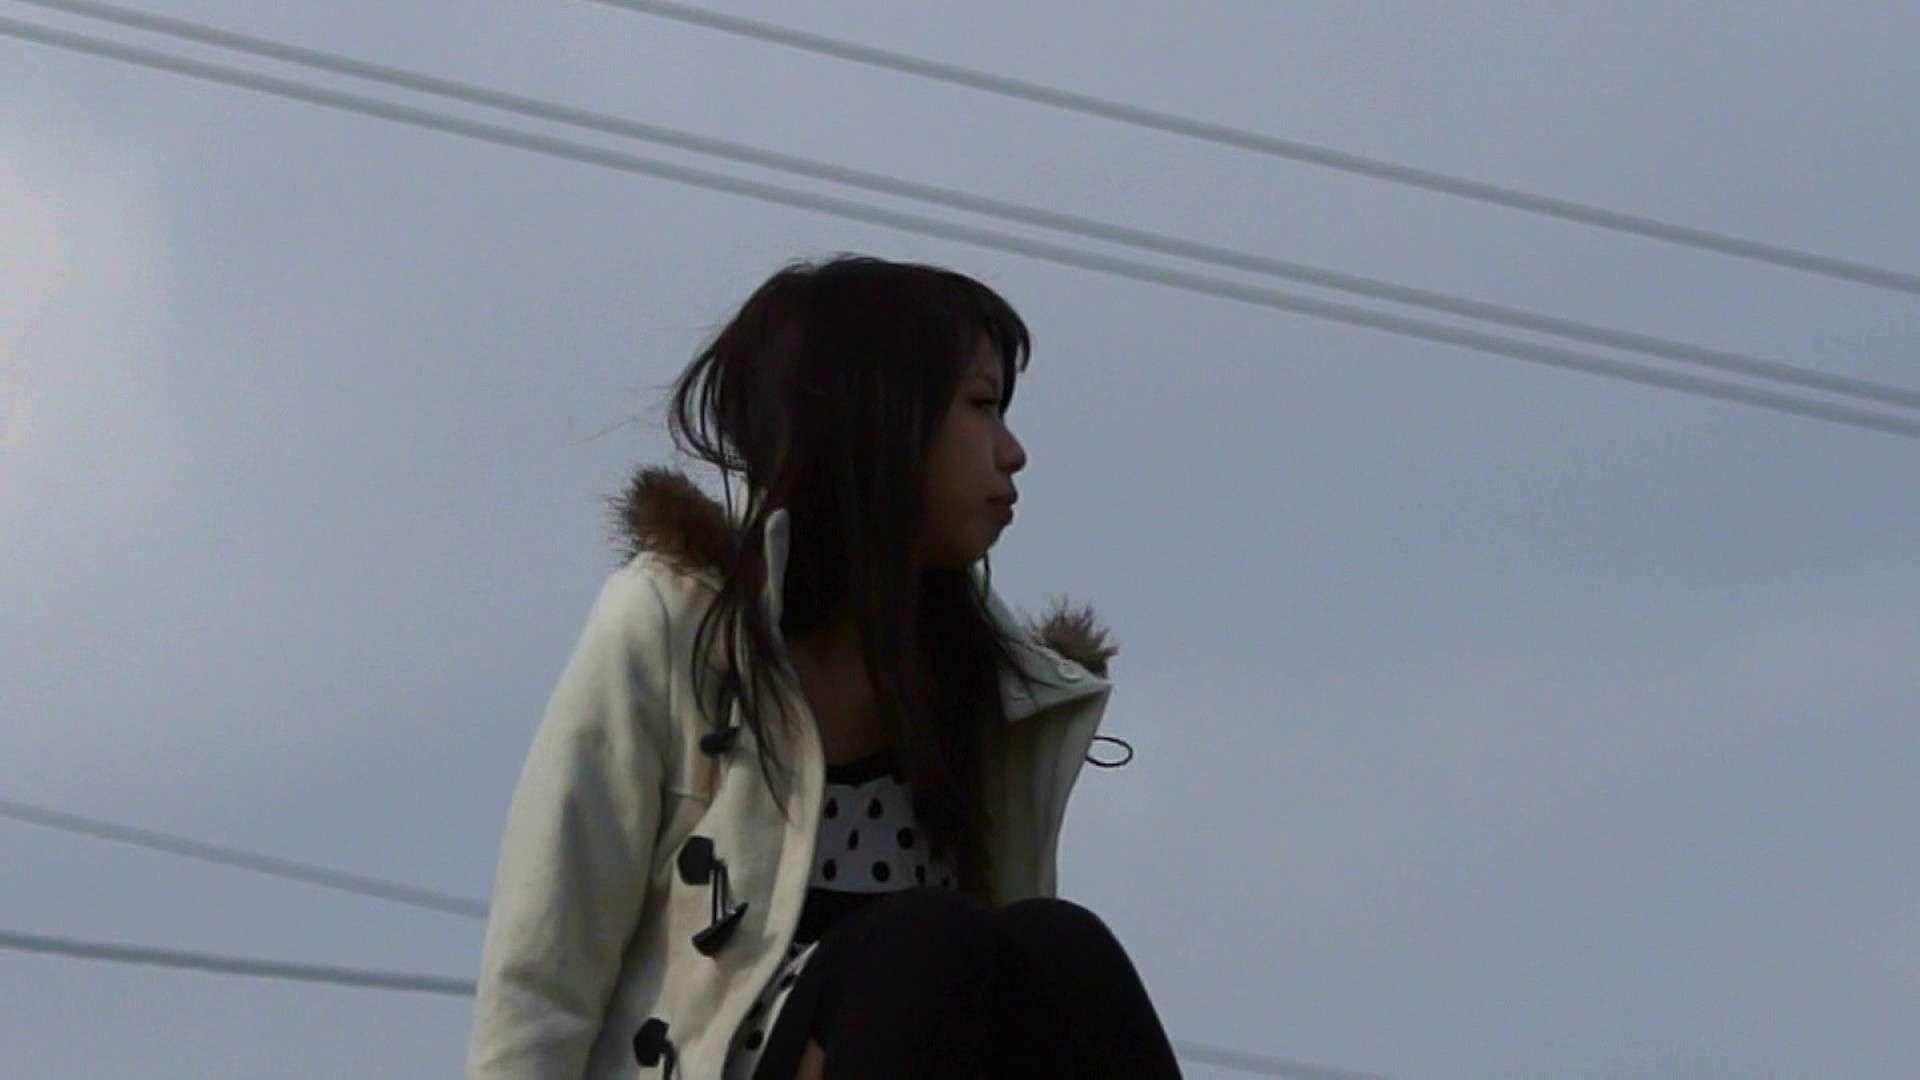 vol.2 自宅近く思い出の地で黄昏る志穂さん 色っぽいOL達  79pic 48